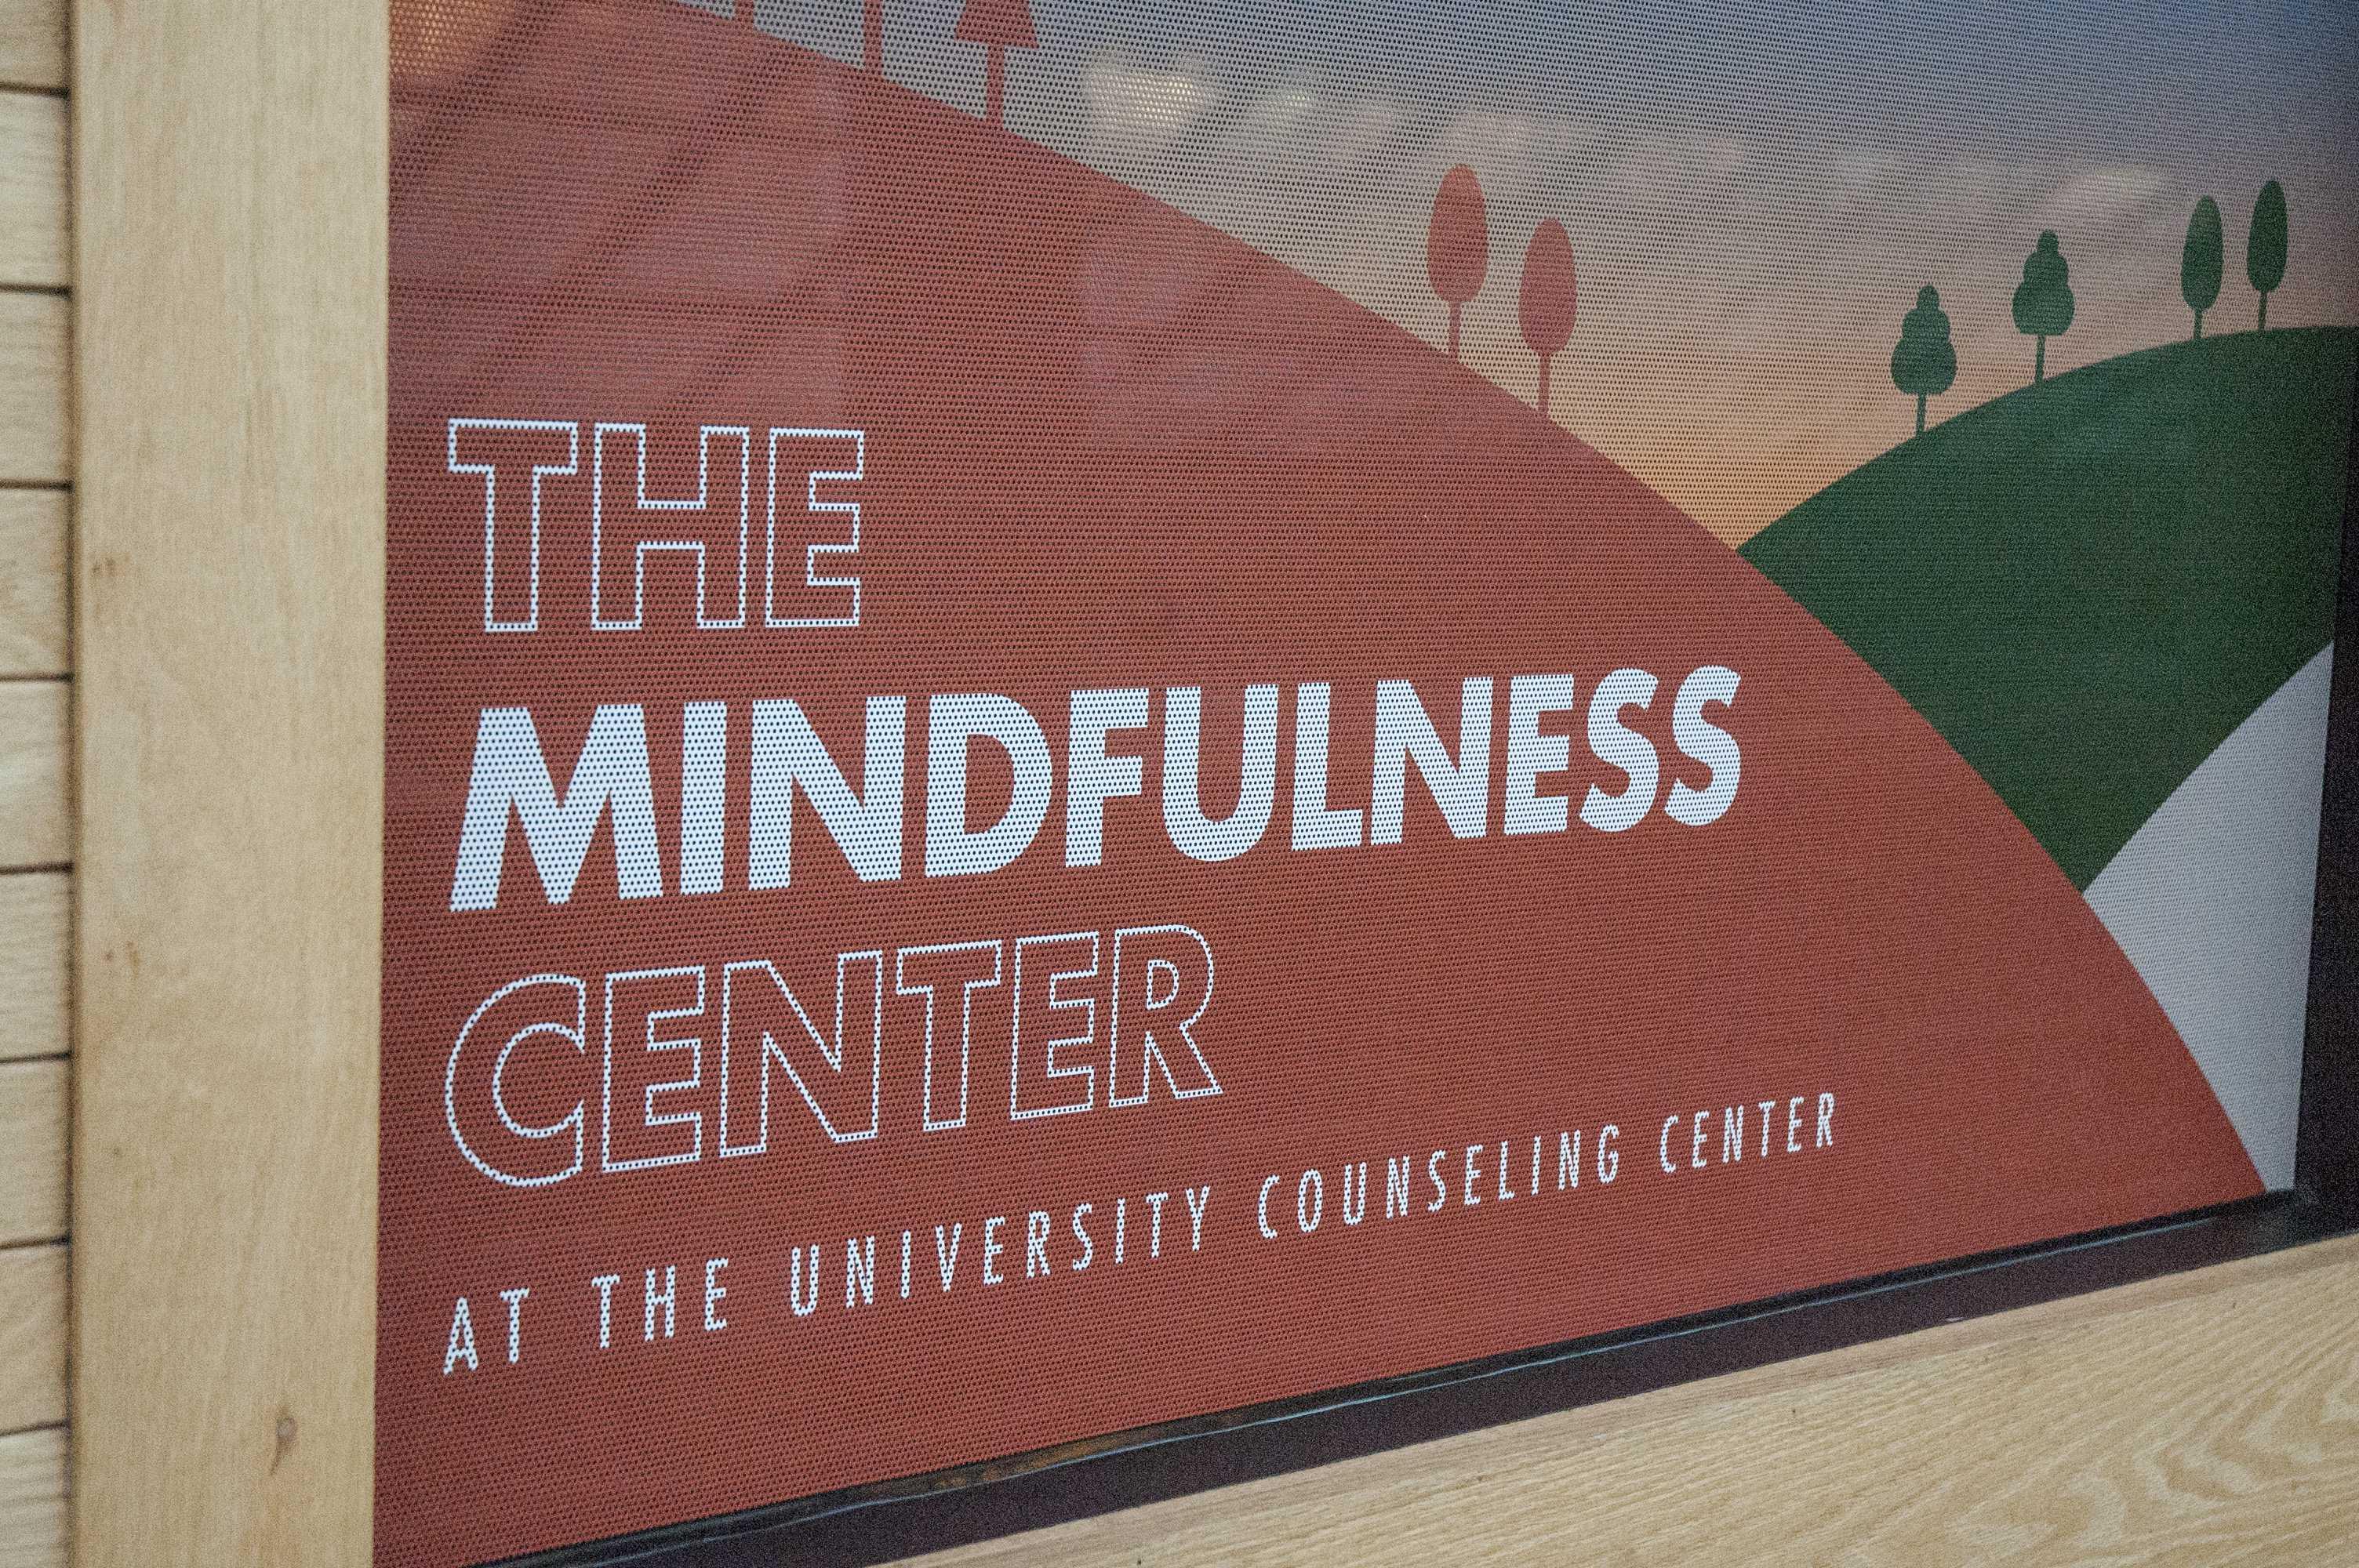 Photos of the Student Wellness center at the University of Utah on January 29, 2019 (Photo by: Matt Gubler || The Daily Utah Chronicle)